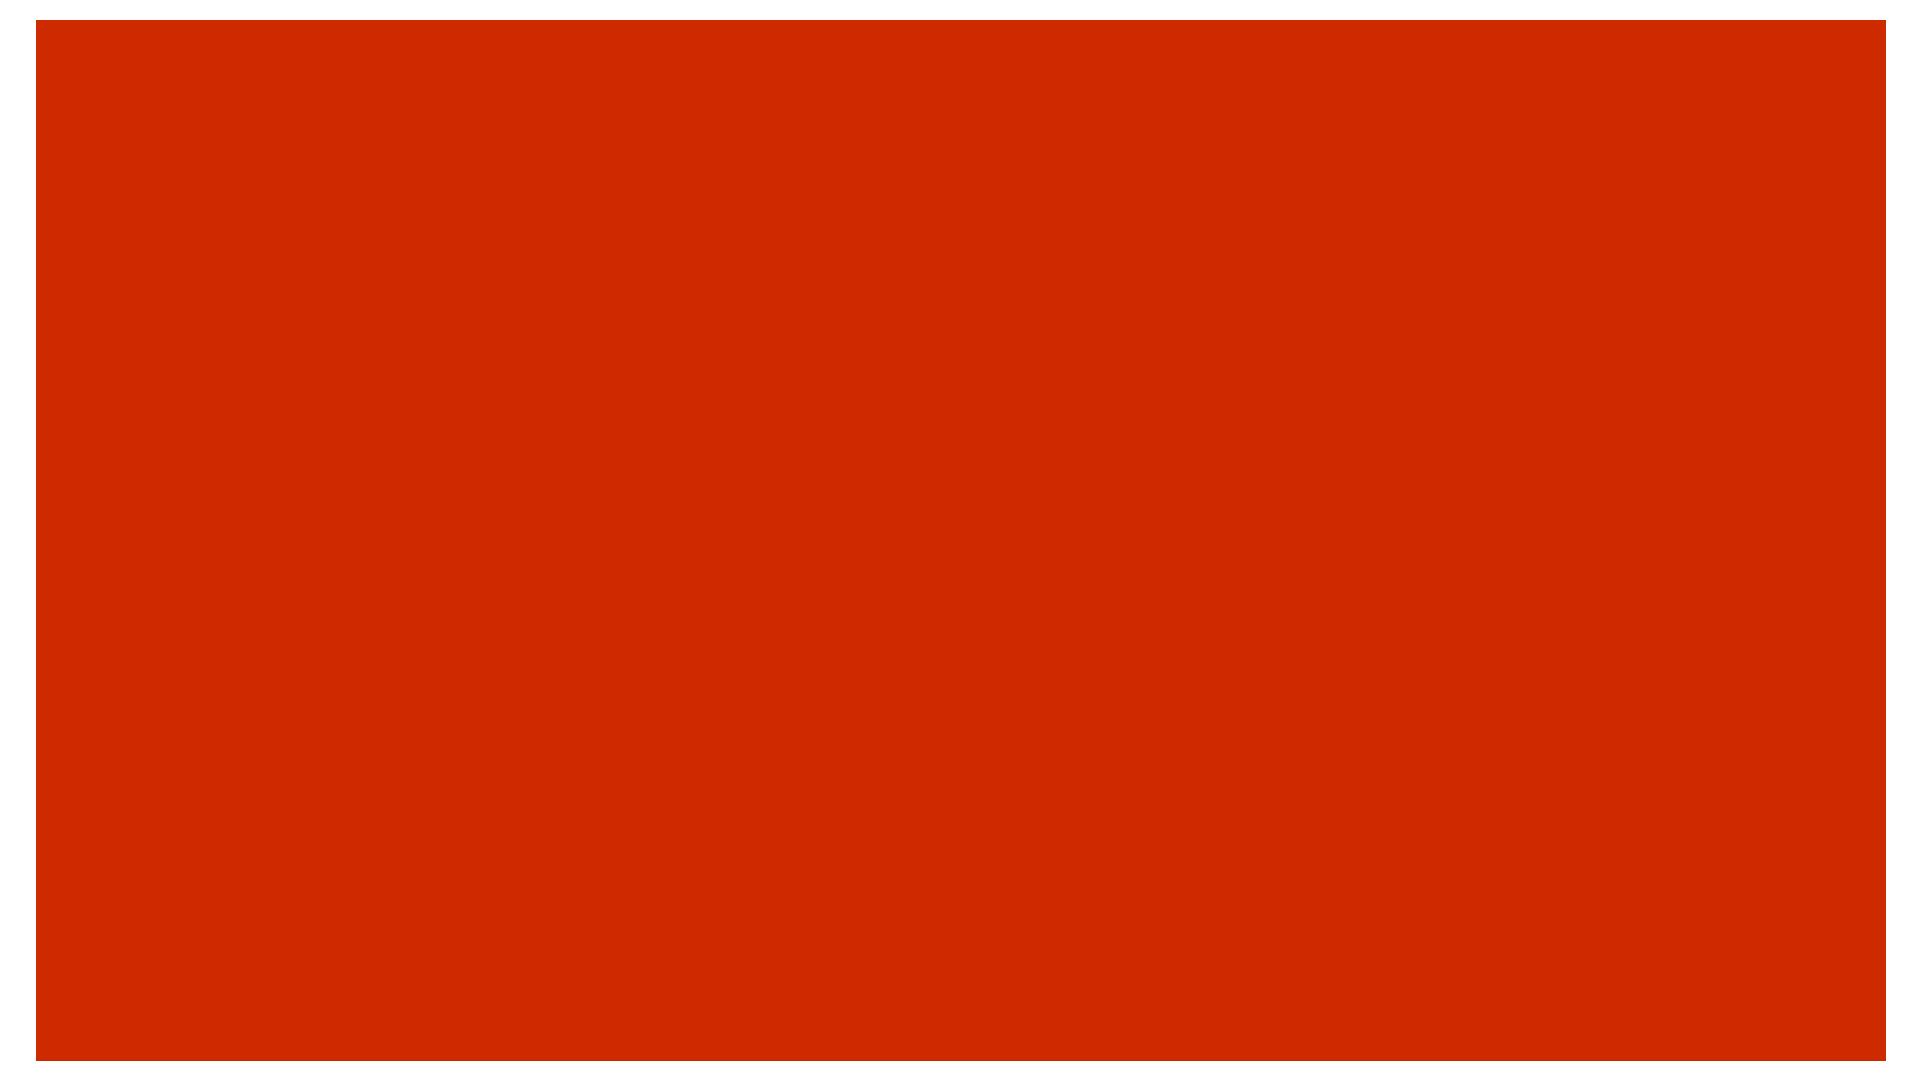 MelgaLaw